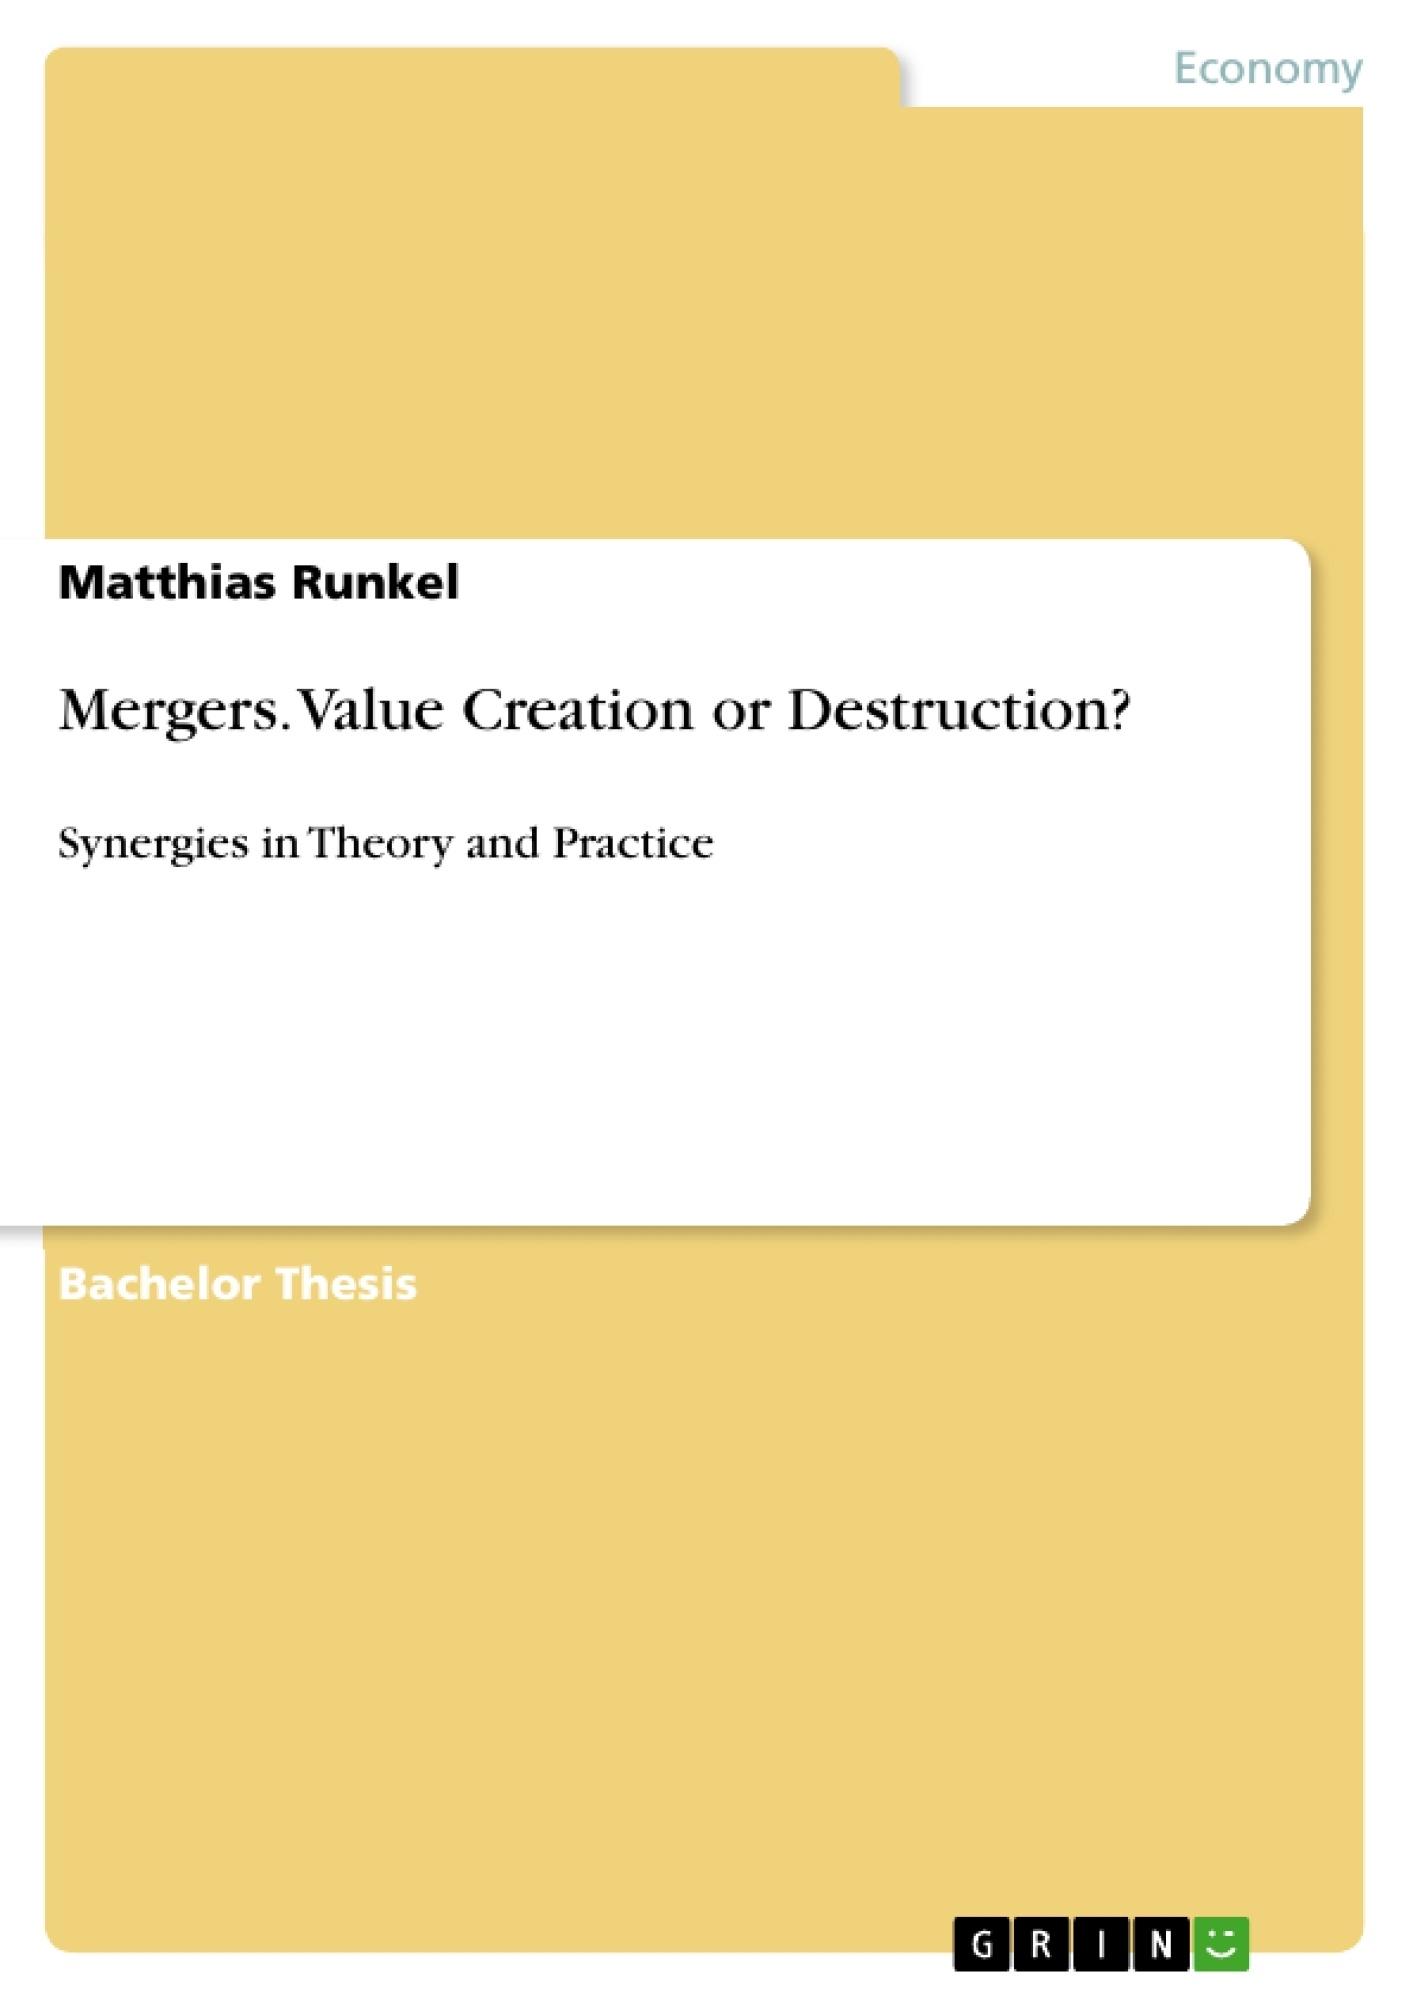 Title: Mergers. Value Creation or Destruction?